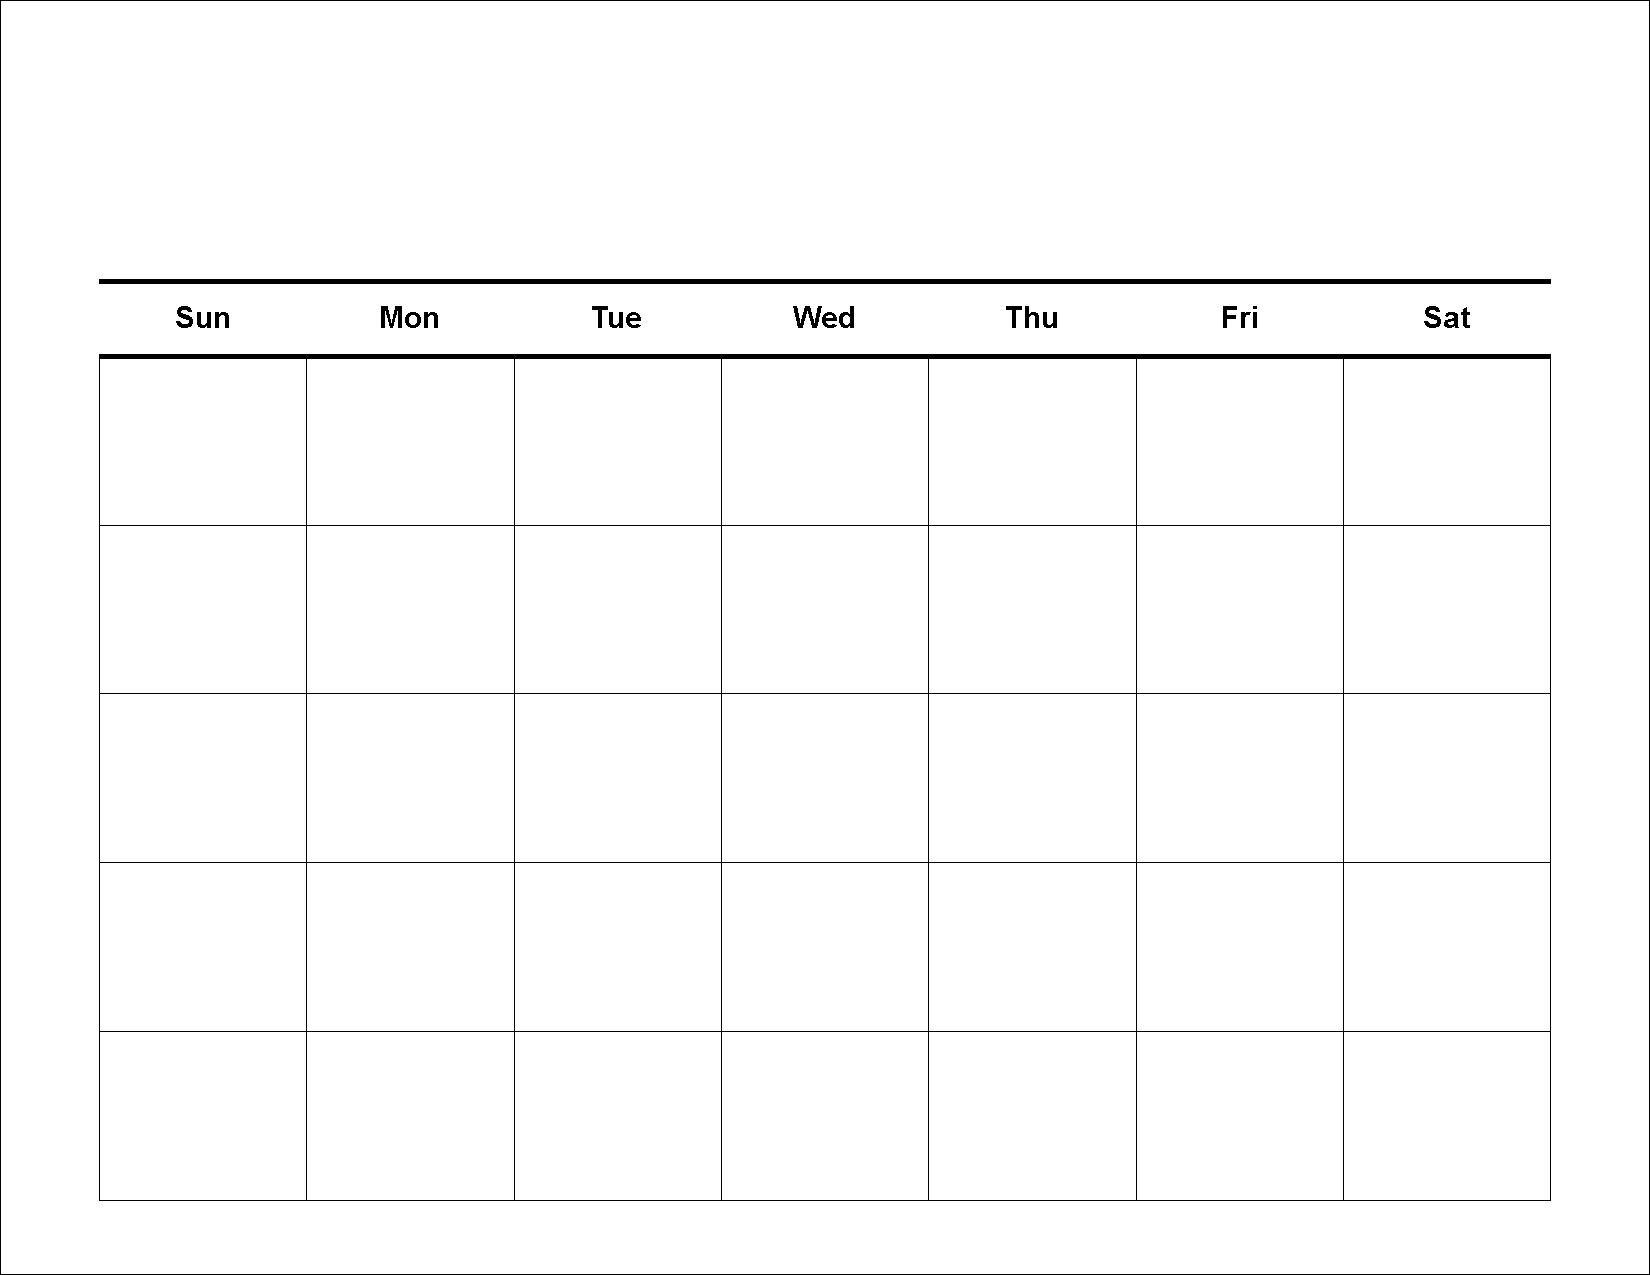 Print Blank Calendar.16 Blank Calendar Template Images Printable Blank Monthly Calendar